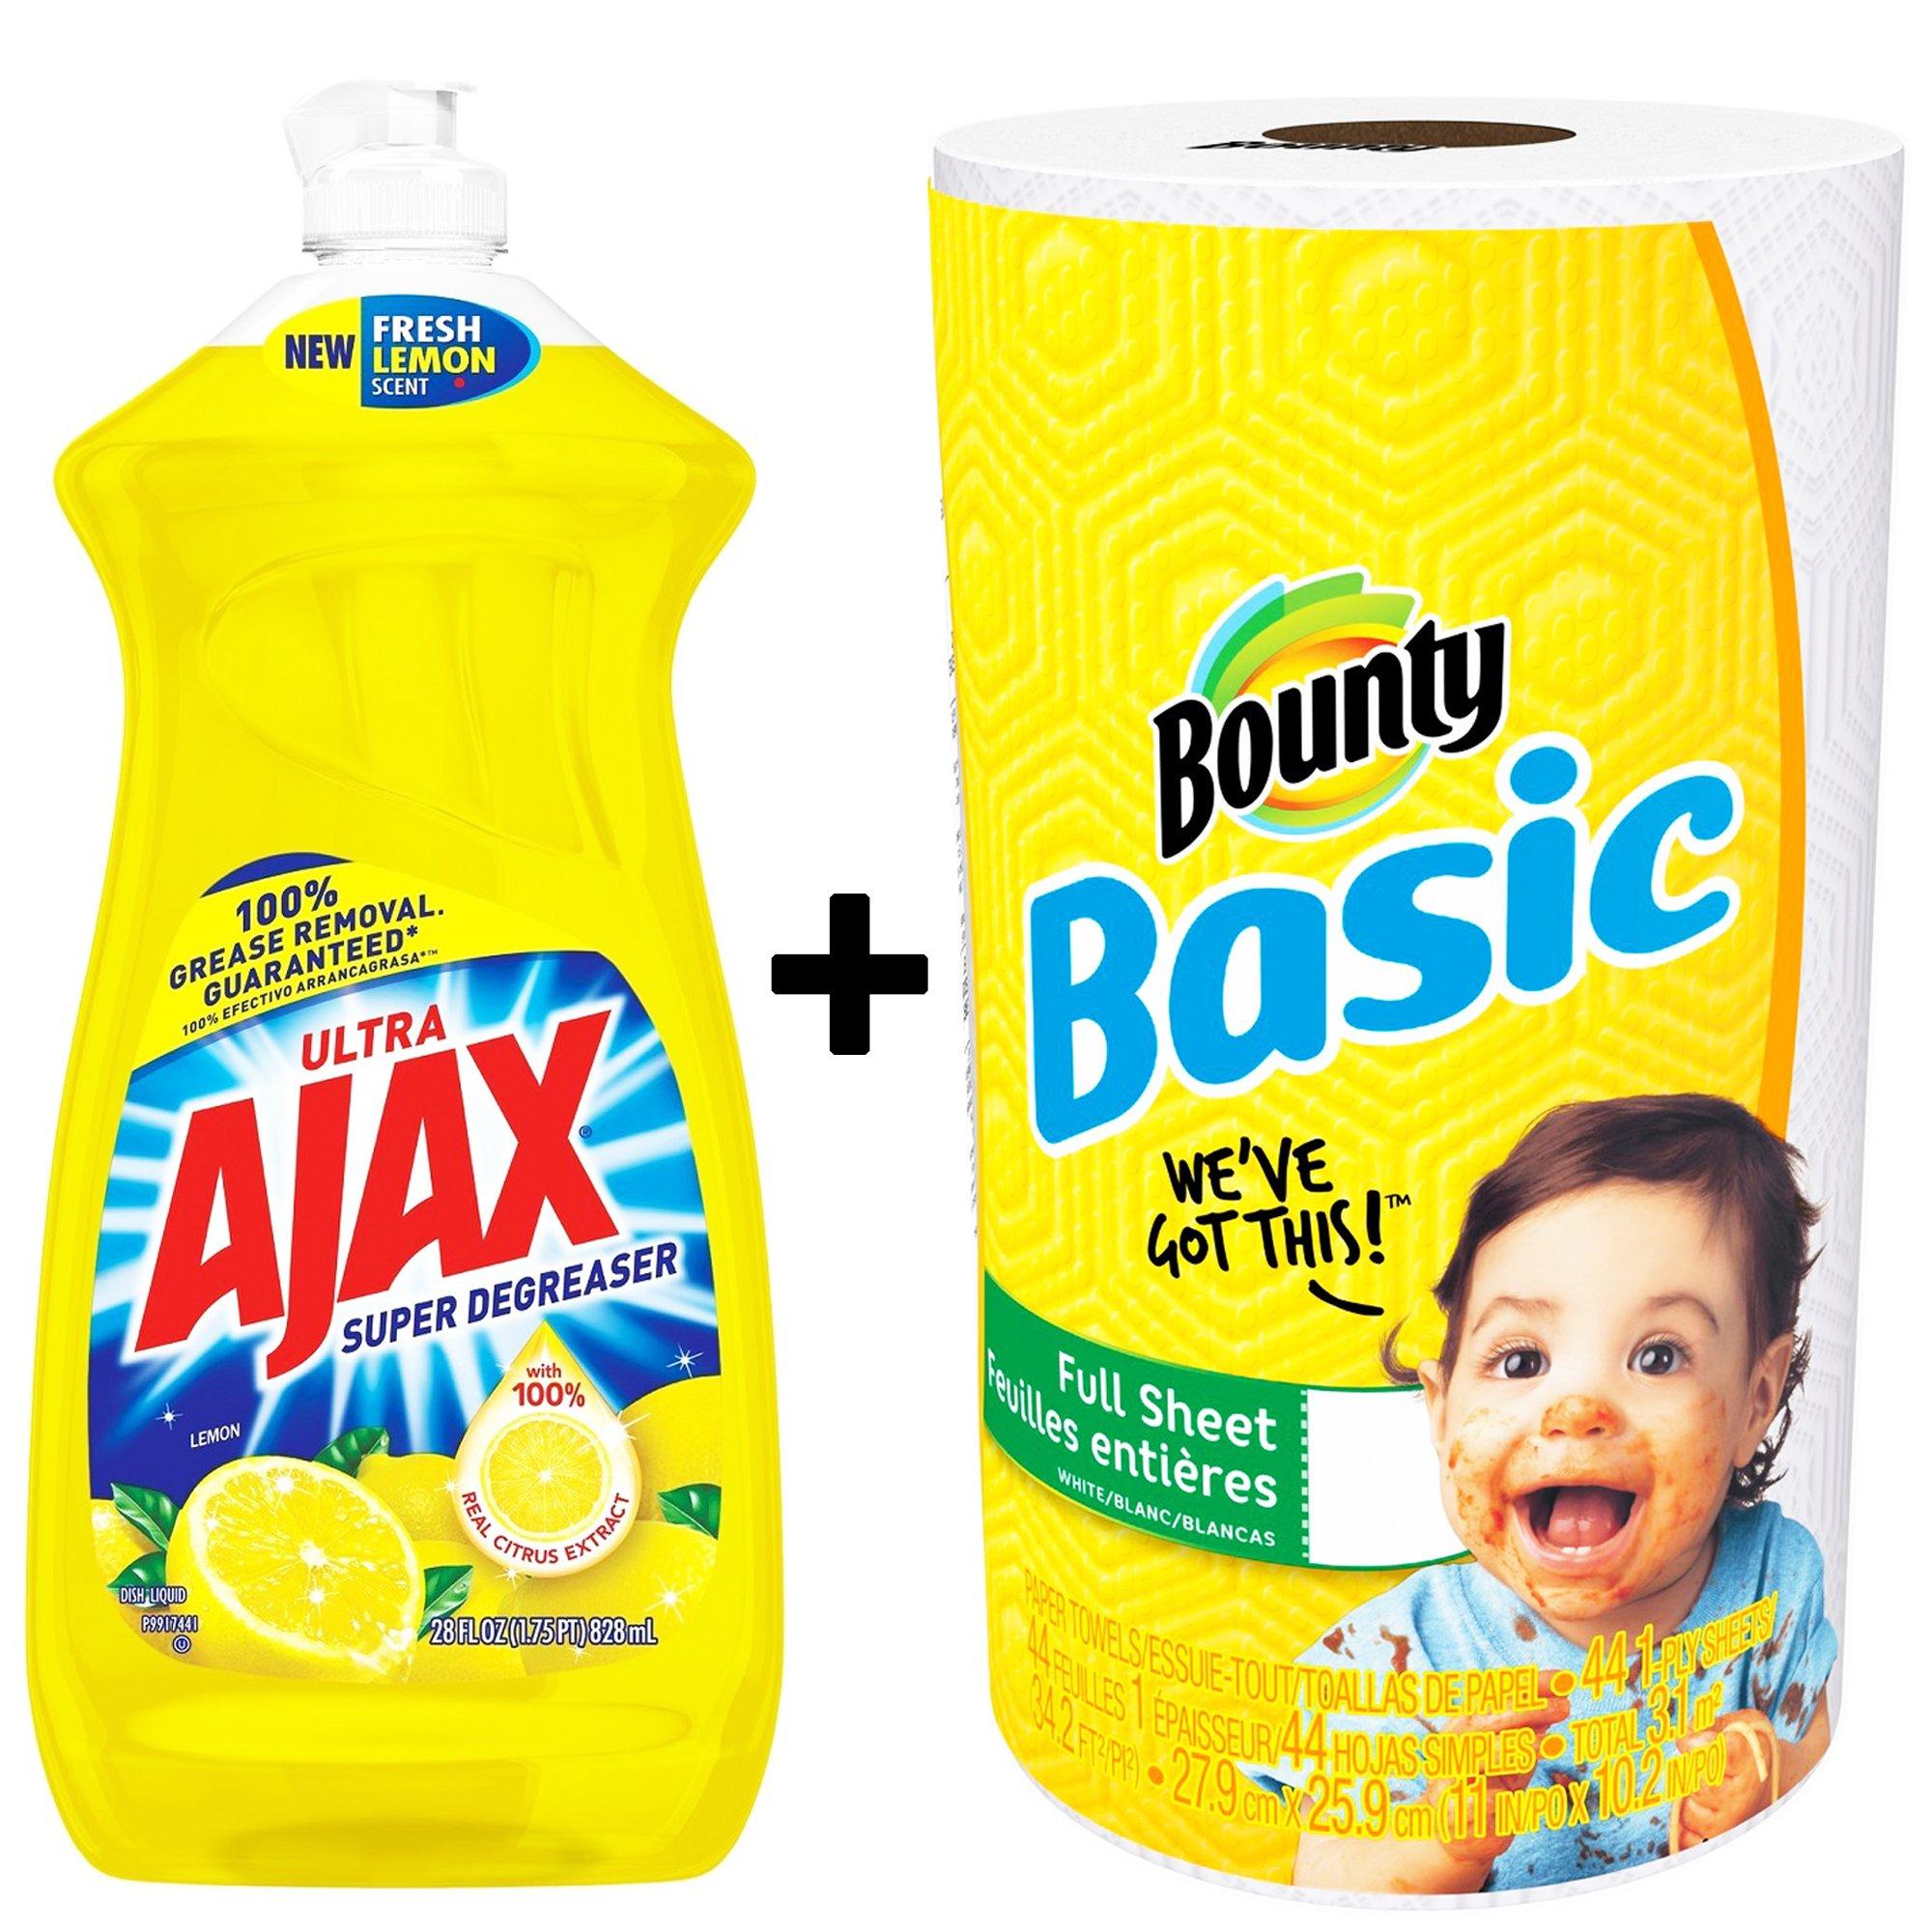 Ajax Dishwashing Liquid Dish Soap 28 Ounce - Lemon, Super Degreaser and Bounty Paper Towel 1 Roll Bundle